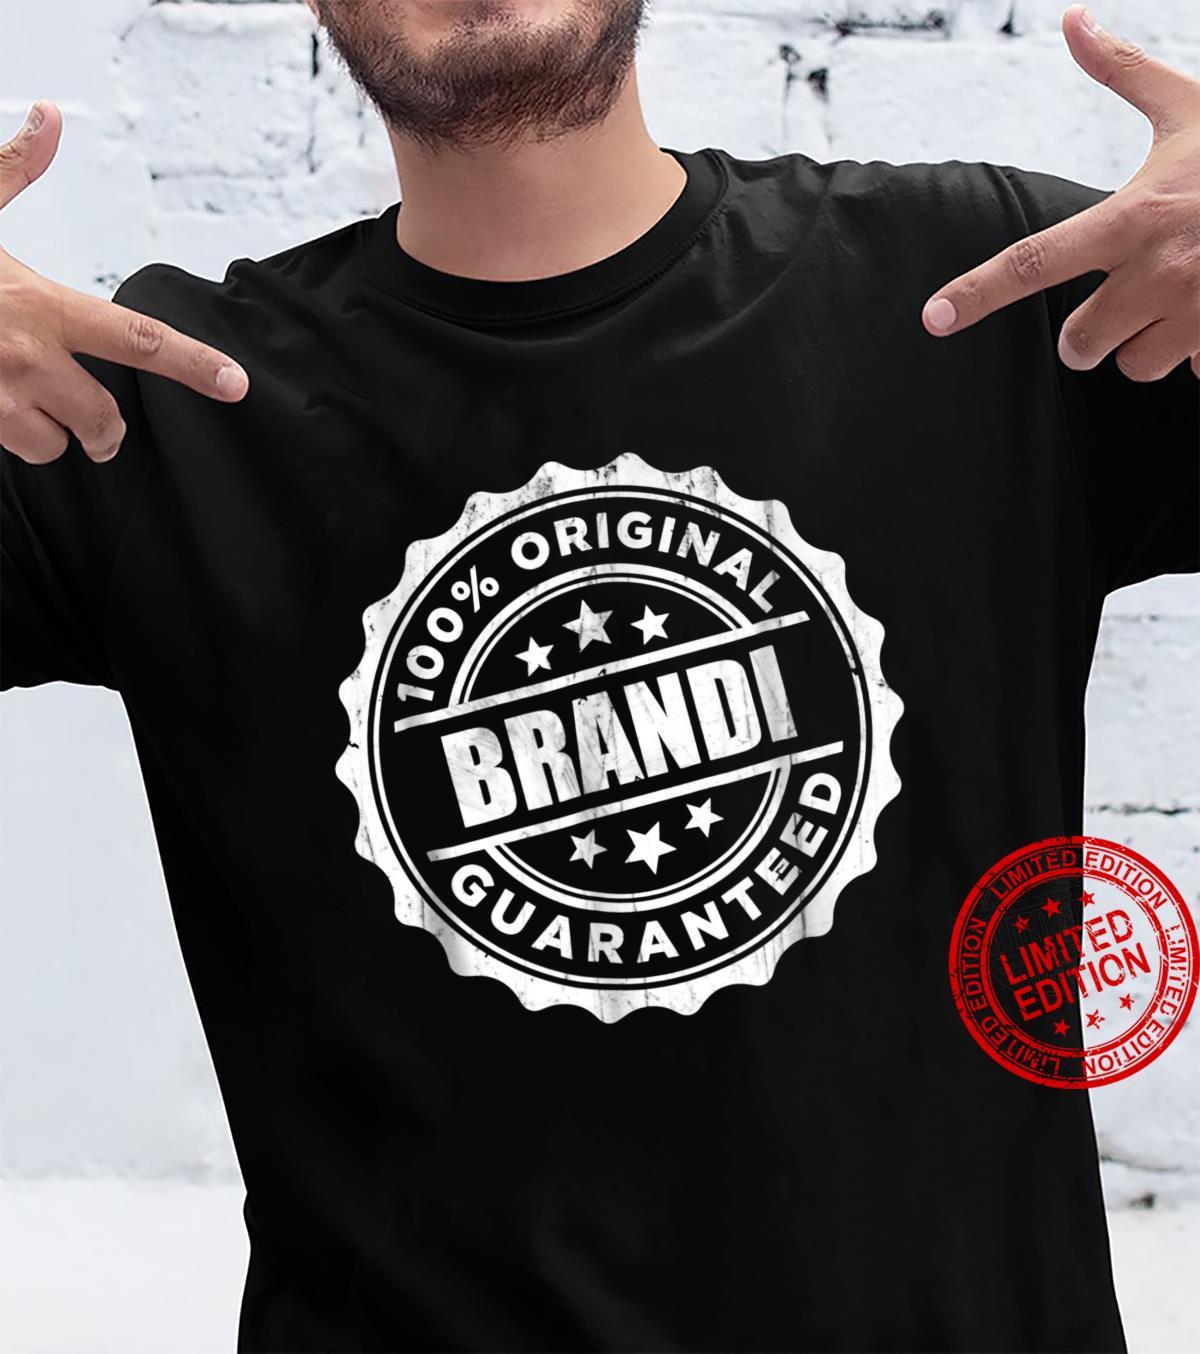 Brandi Shirt 100% Original Guaranteed Shirt